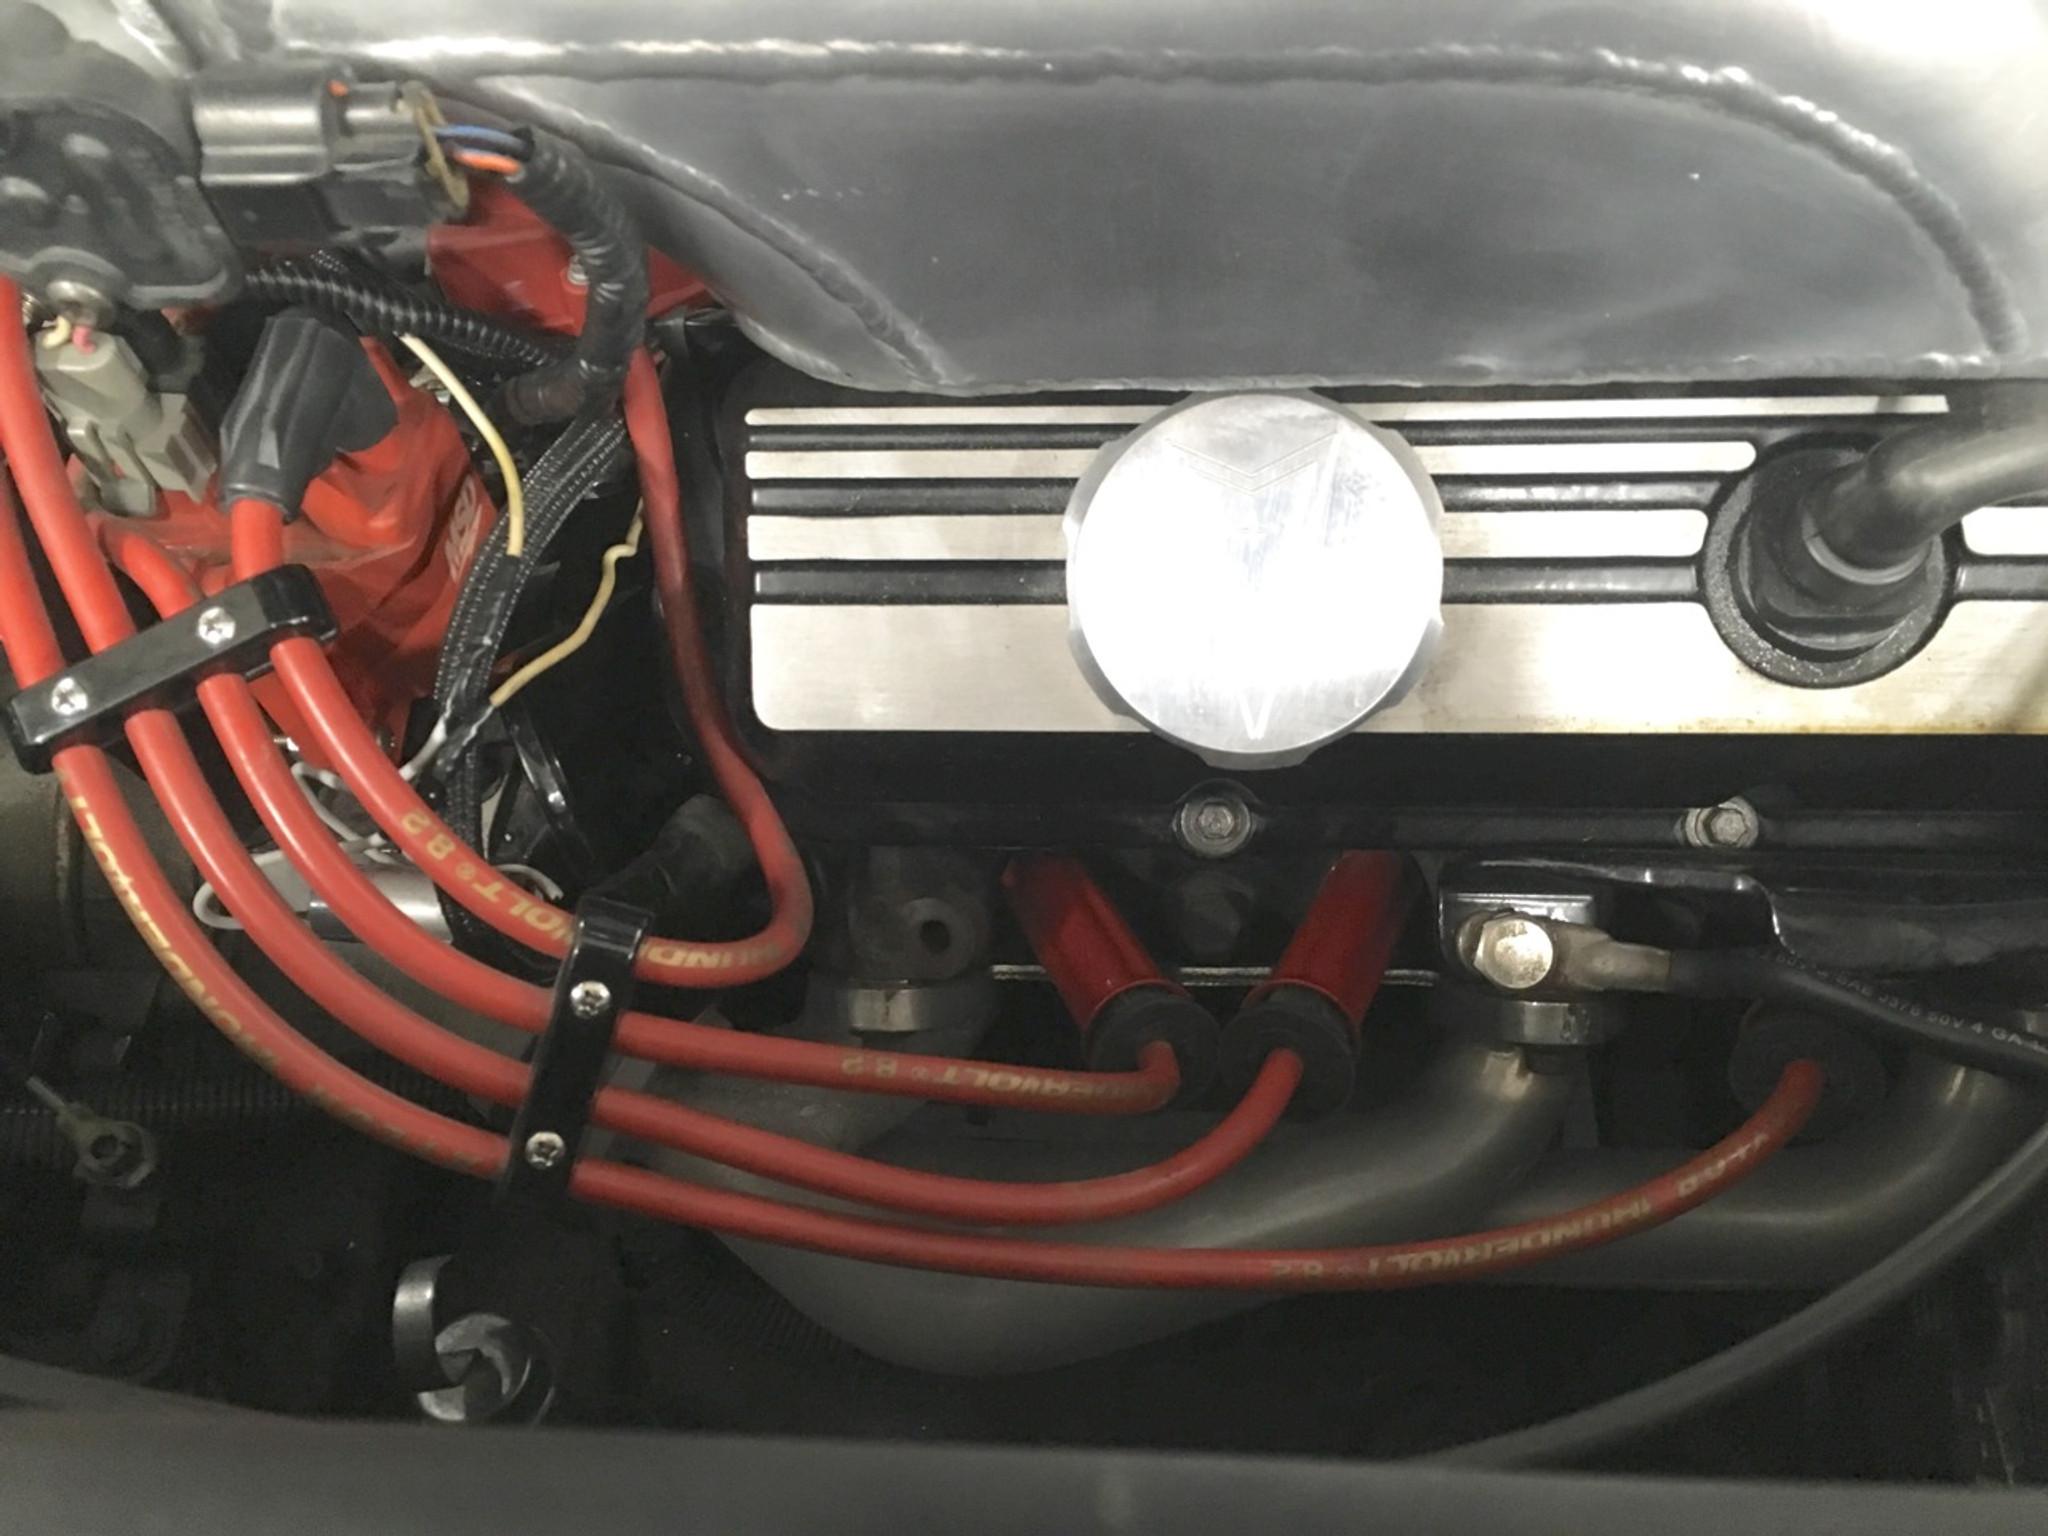 Taylor Cable Pontiac Fiero 2.8L V6 8.2mm Performance Spark Plug Wire ...